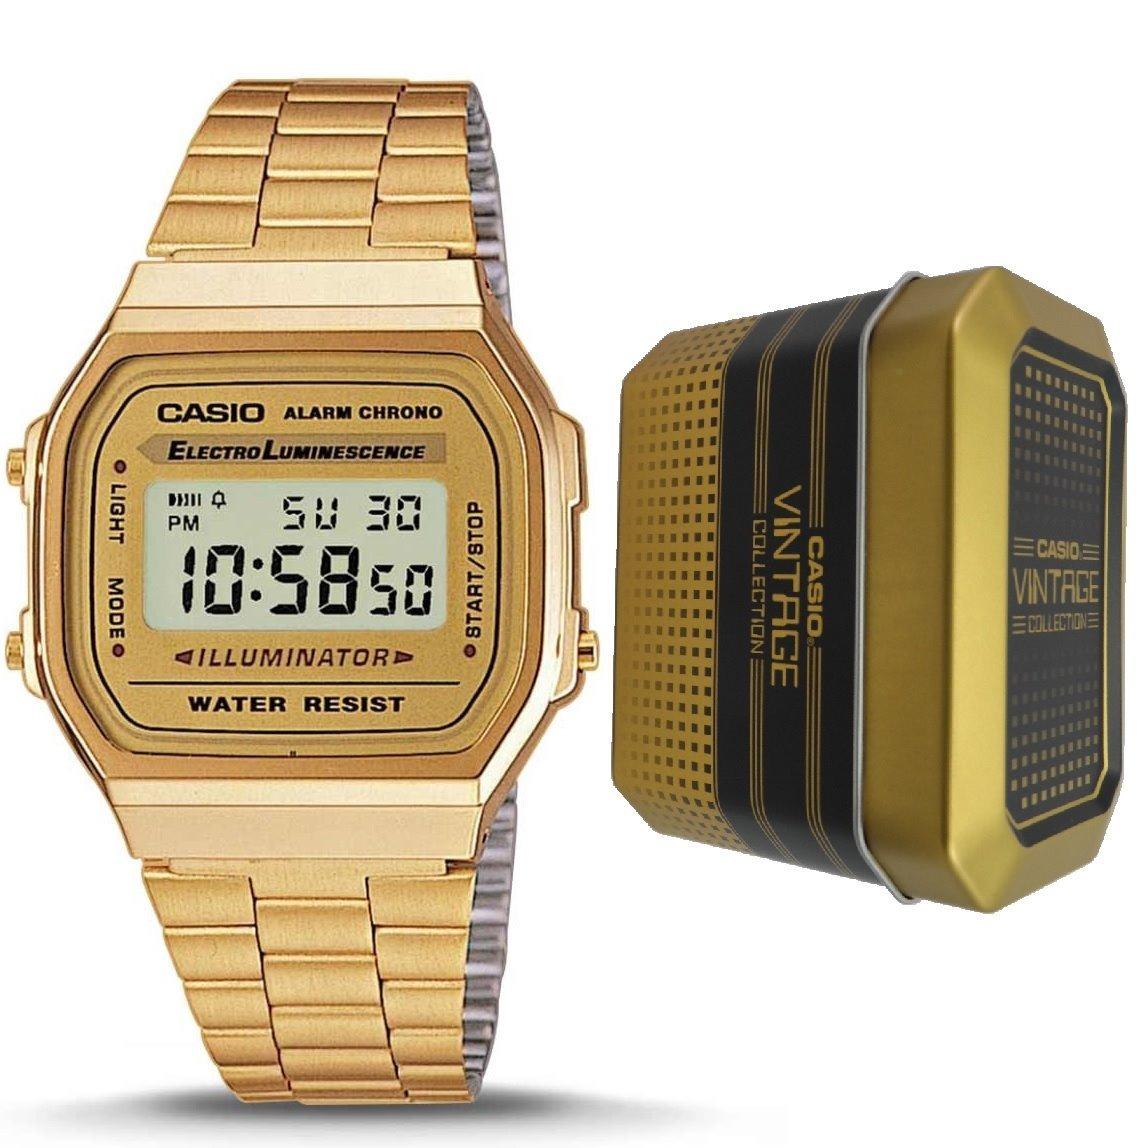 b1f42ebb0b0 Reloj Casio Retro Dorado Vintage A168wg-9w Original Unisex ...